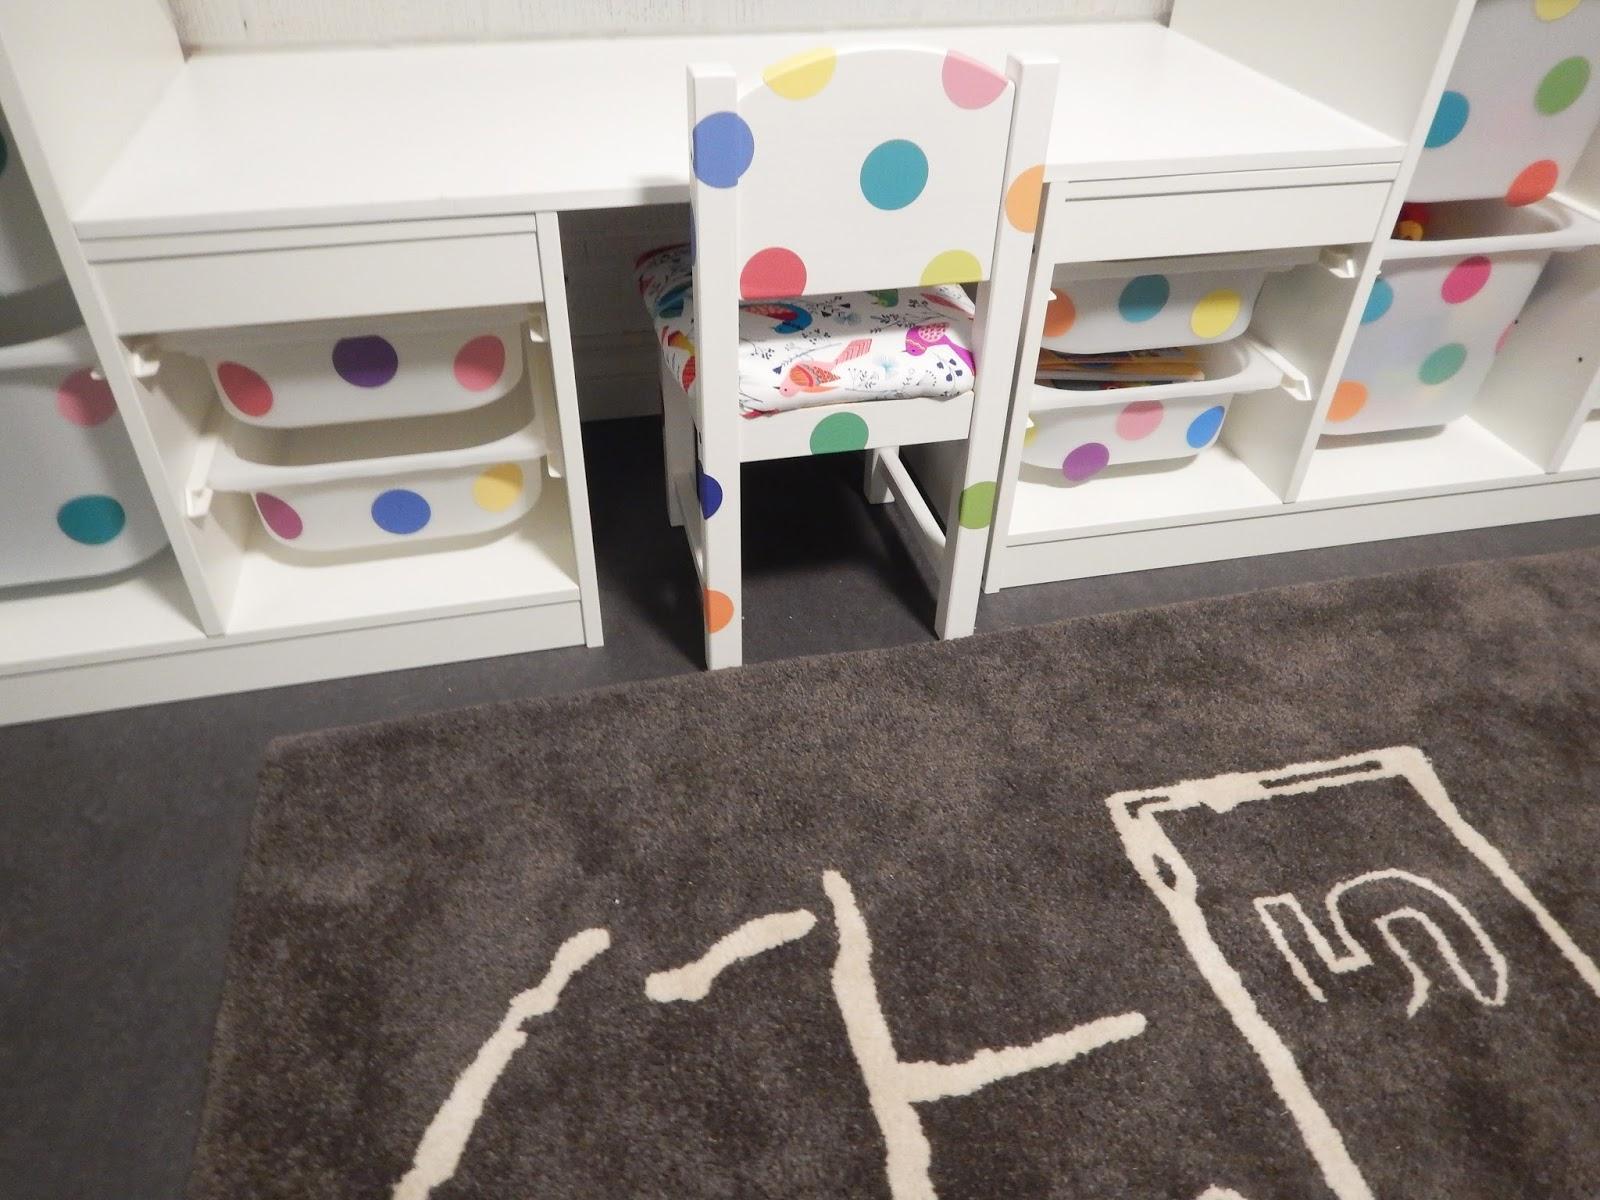 Ikea Hack Trofast Storage System Sundvik Chair Ribba Picture Ledge Dream Desk